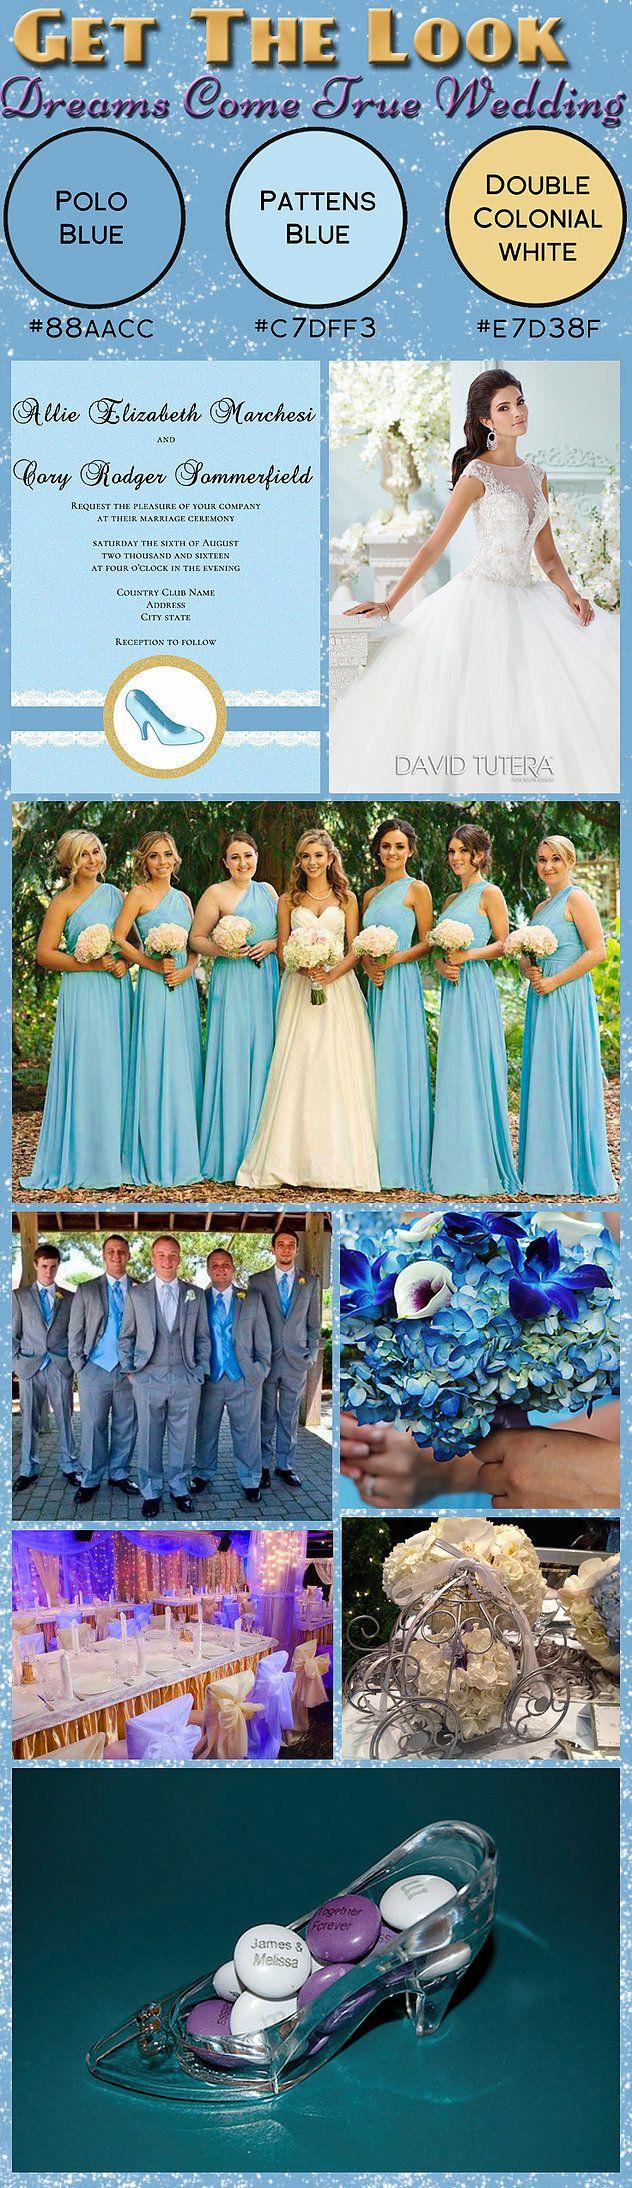 cinderellthemed wedding scroll invitations%0A Fairy Tale Wedding Inspiration  Based off Disney u    s Cinderella  Glass  Slipper  Dreams Come True